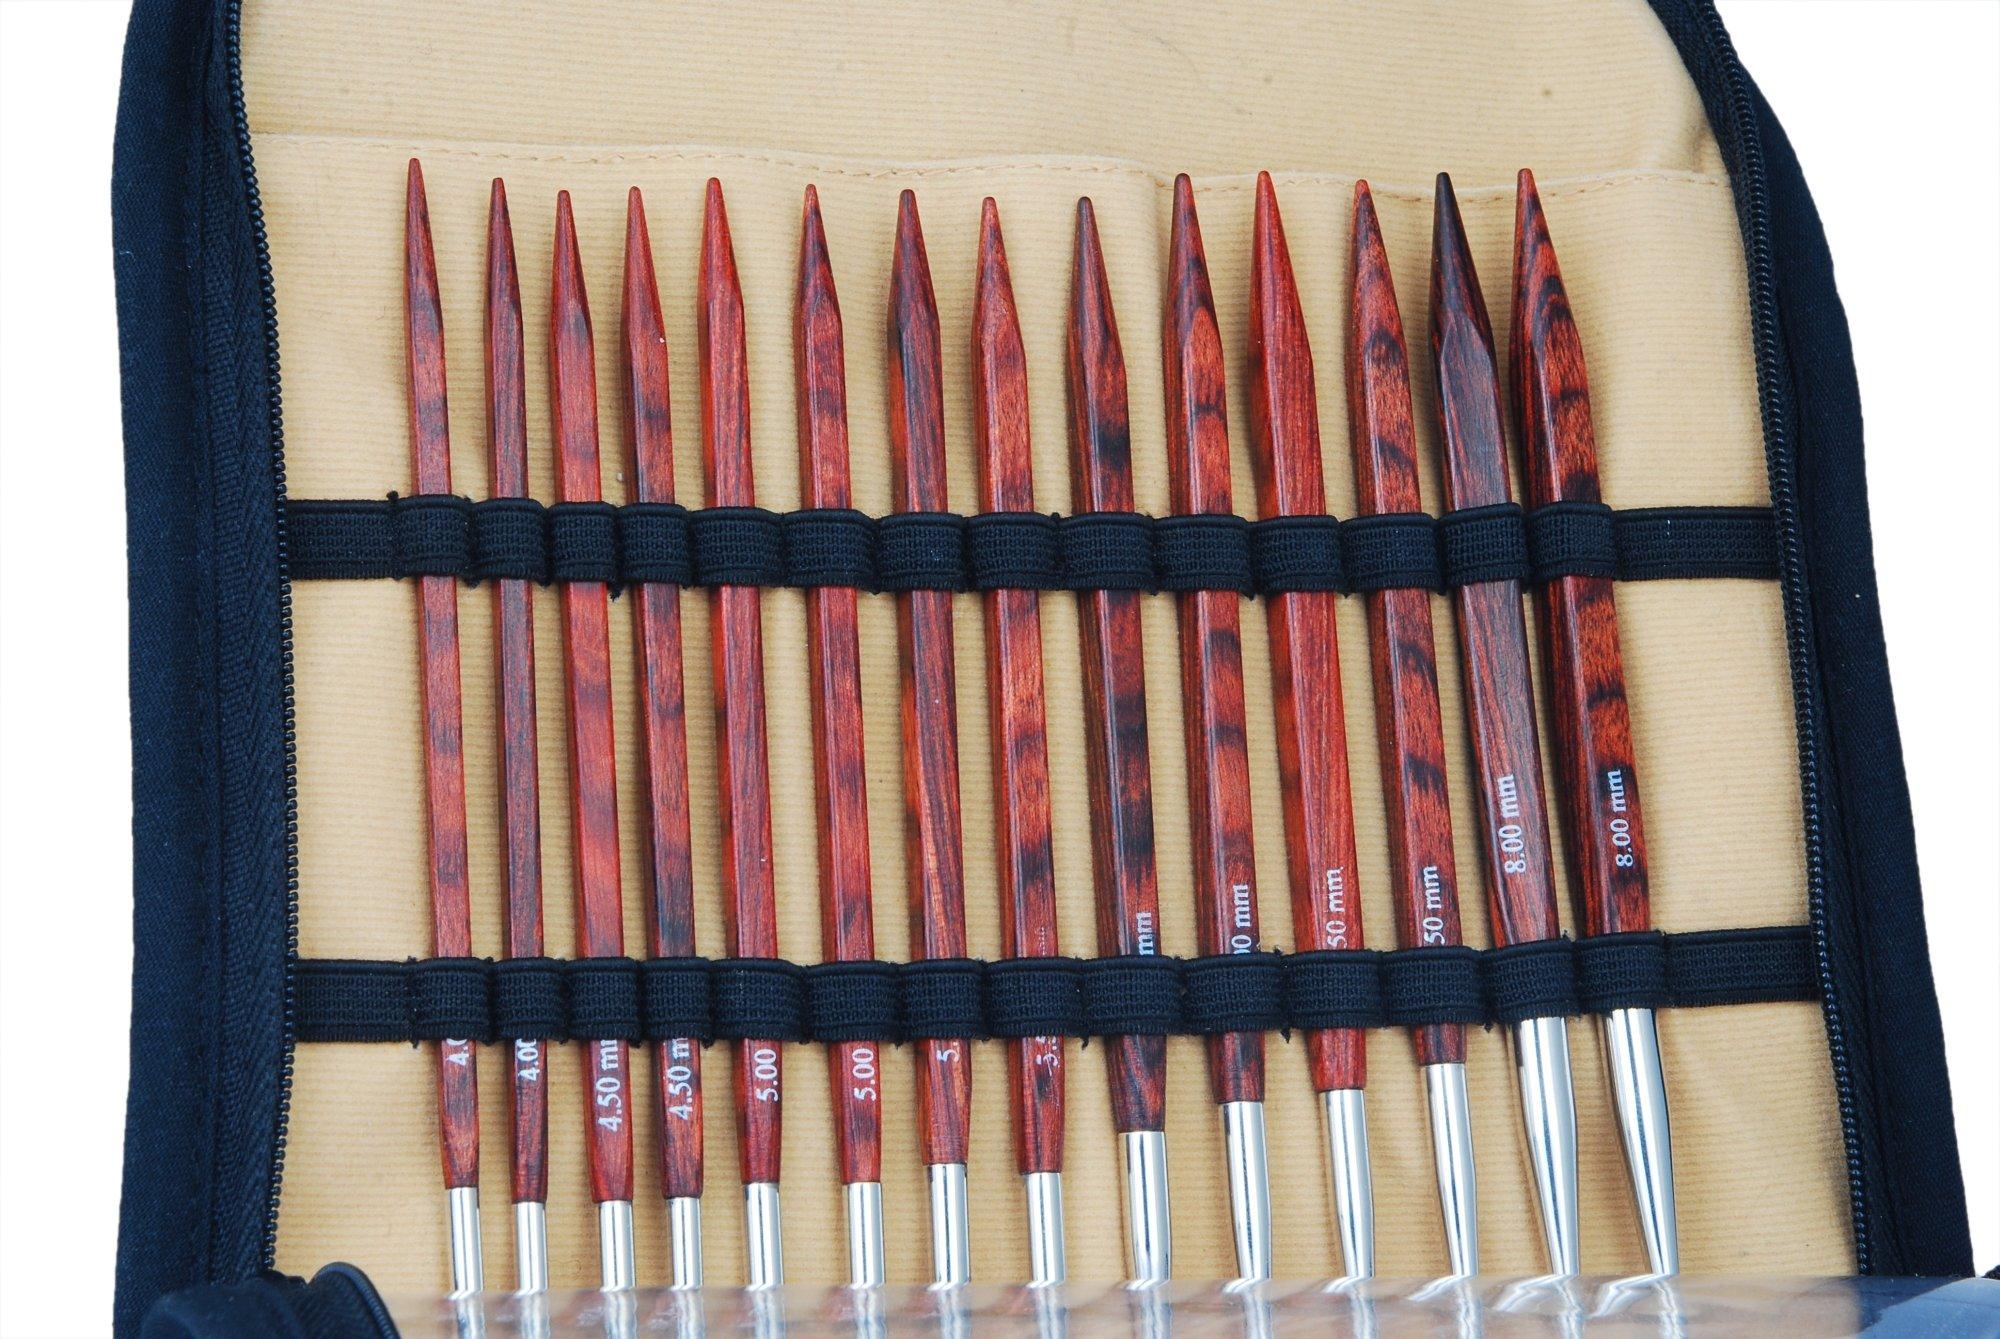 KnitPro - Deluxe - Interchangeable Needle Set - Cubics by Knit Pro (Image #3)